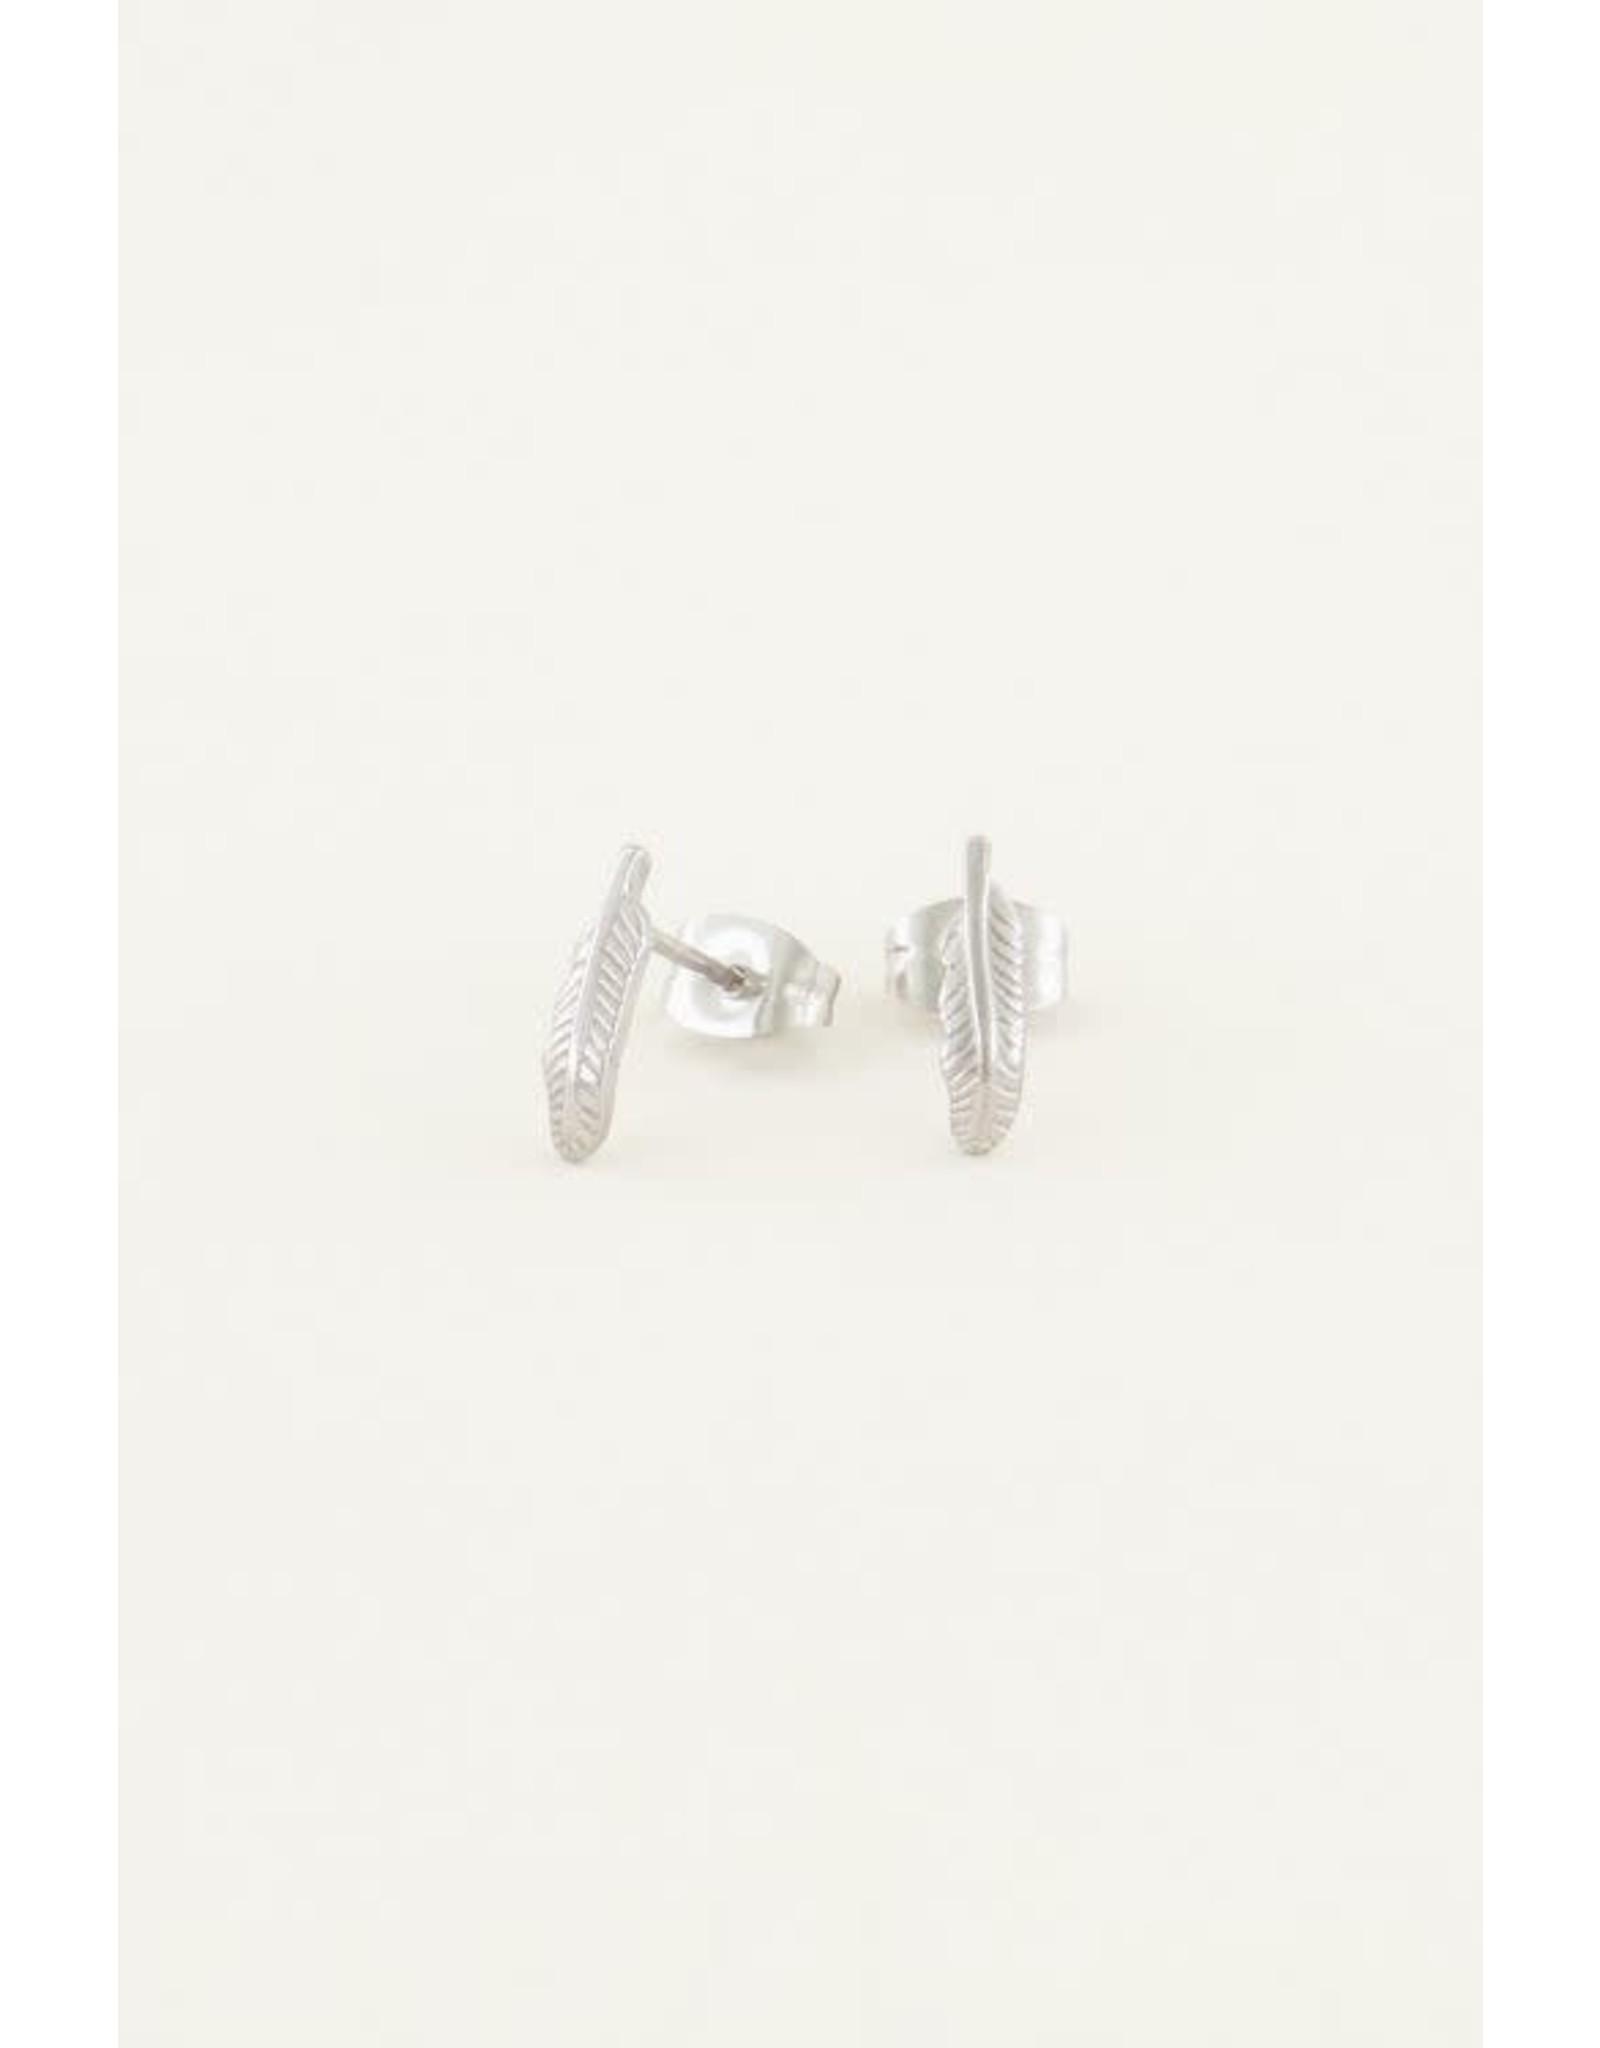 My Jewellery Earstuds - veertje